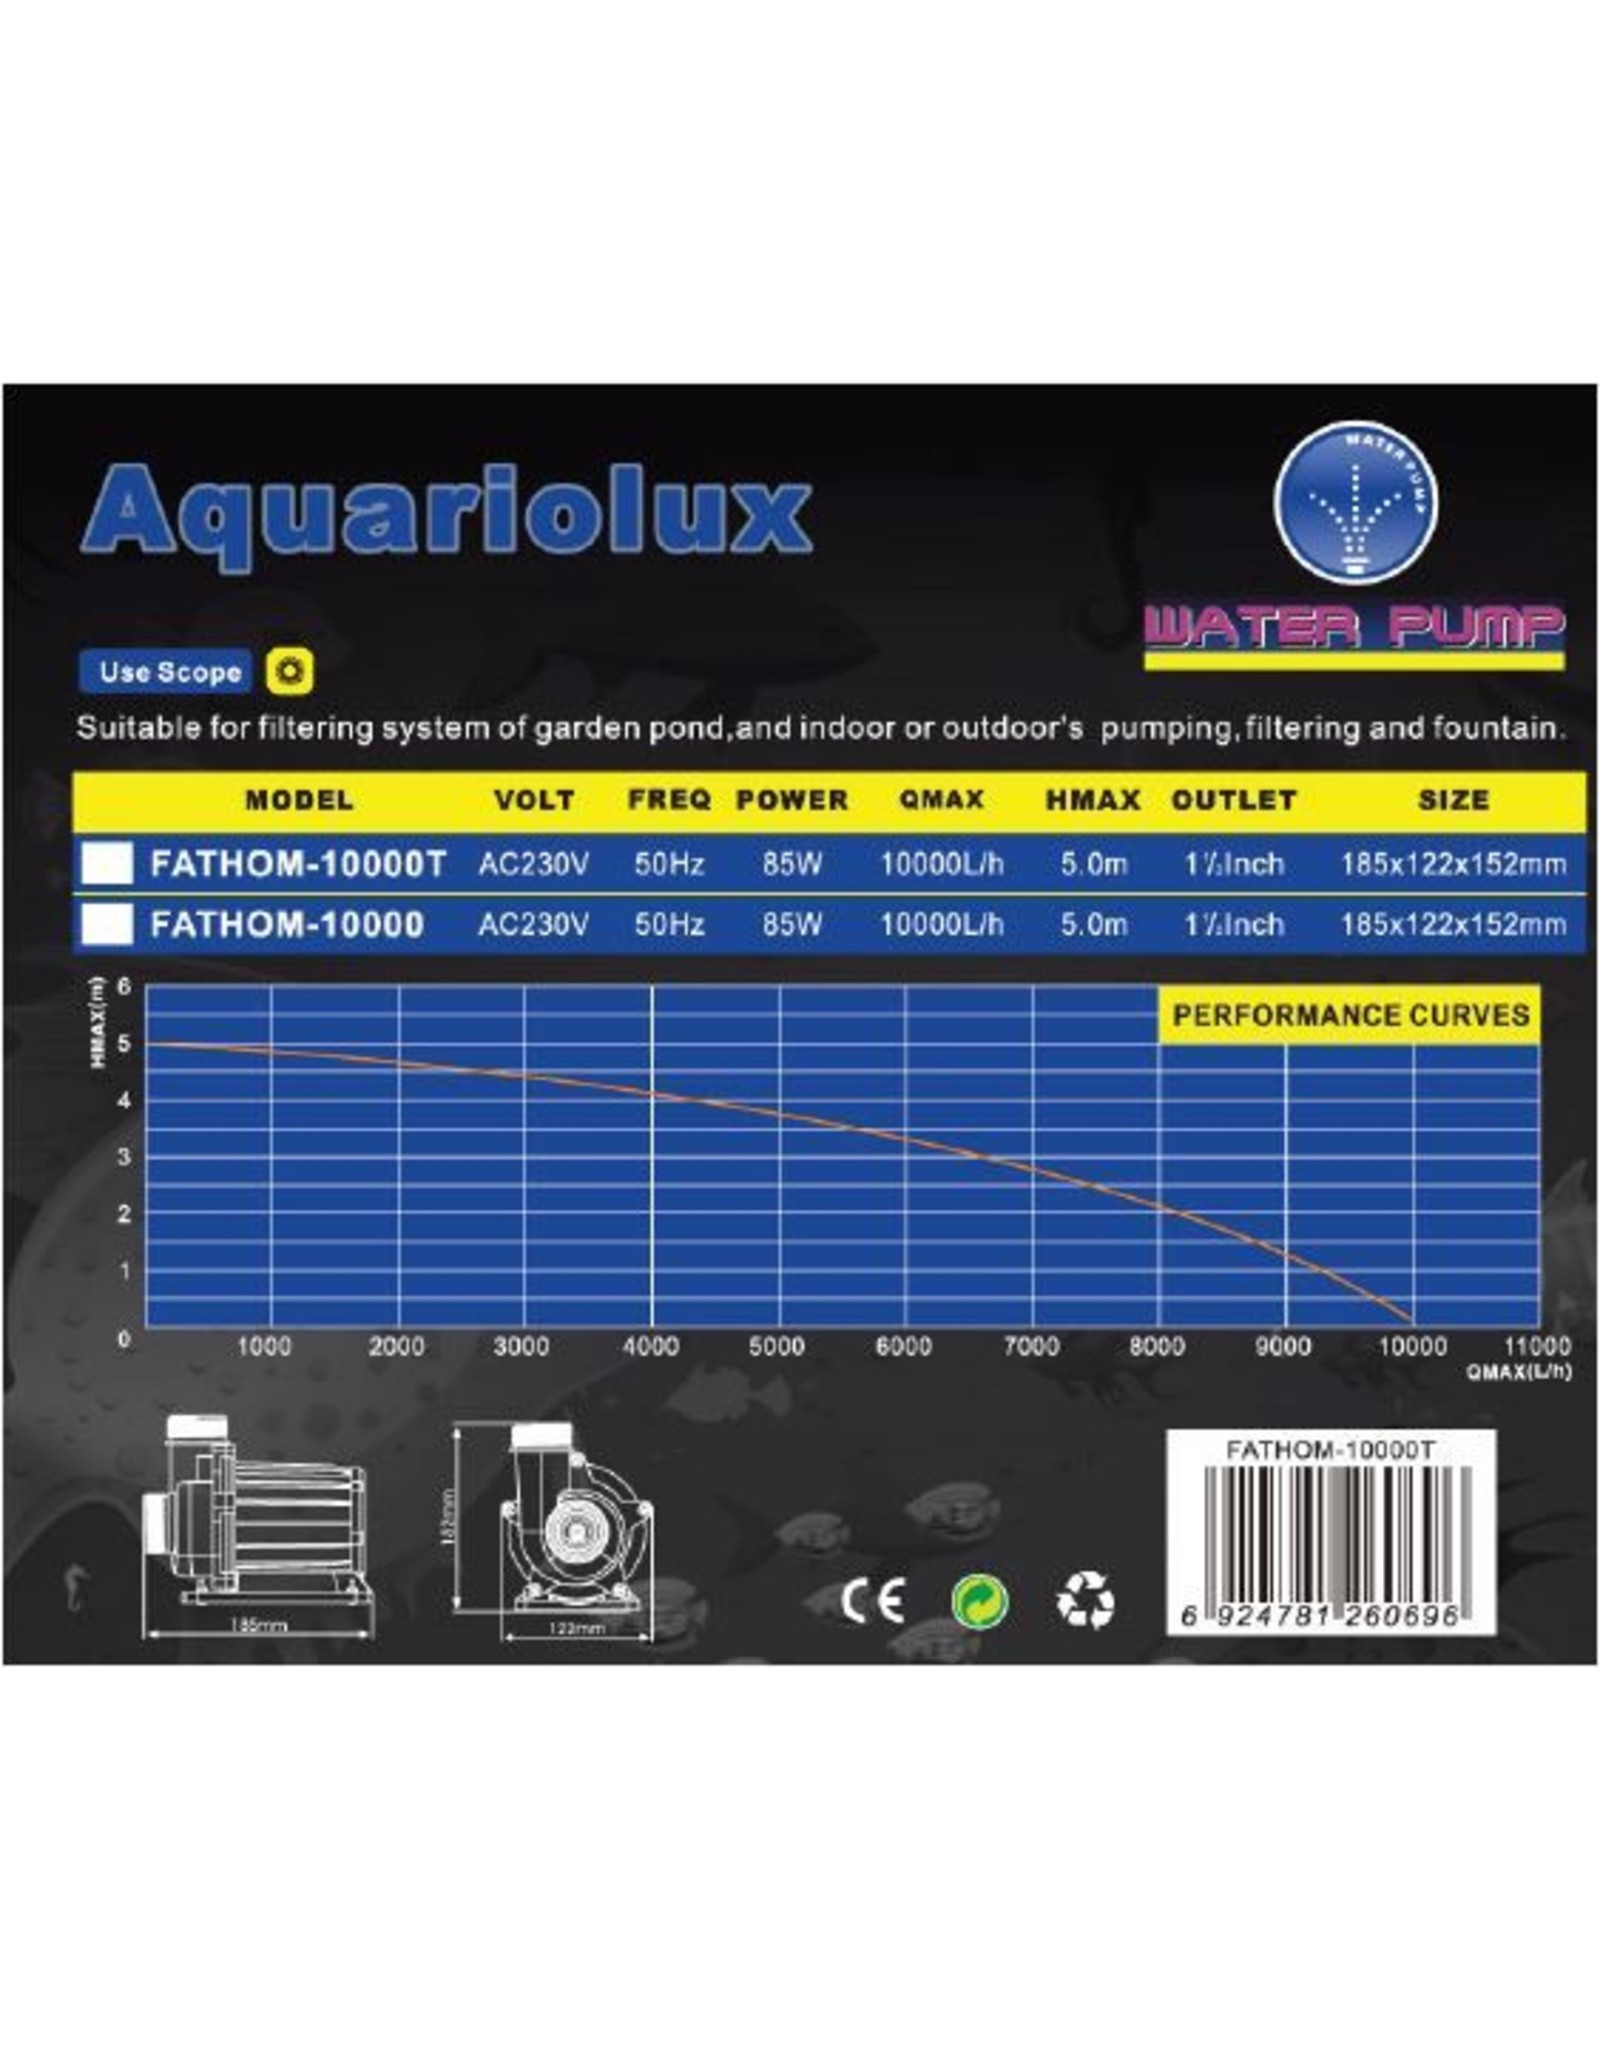 Aquariolux Fathom 10000 85 Watt eco pond pump